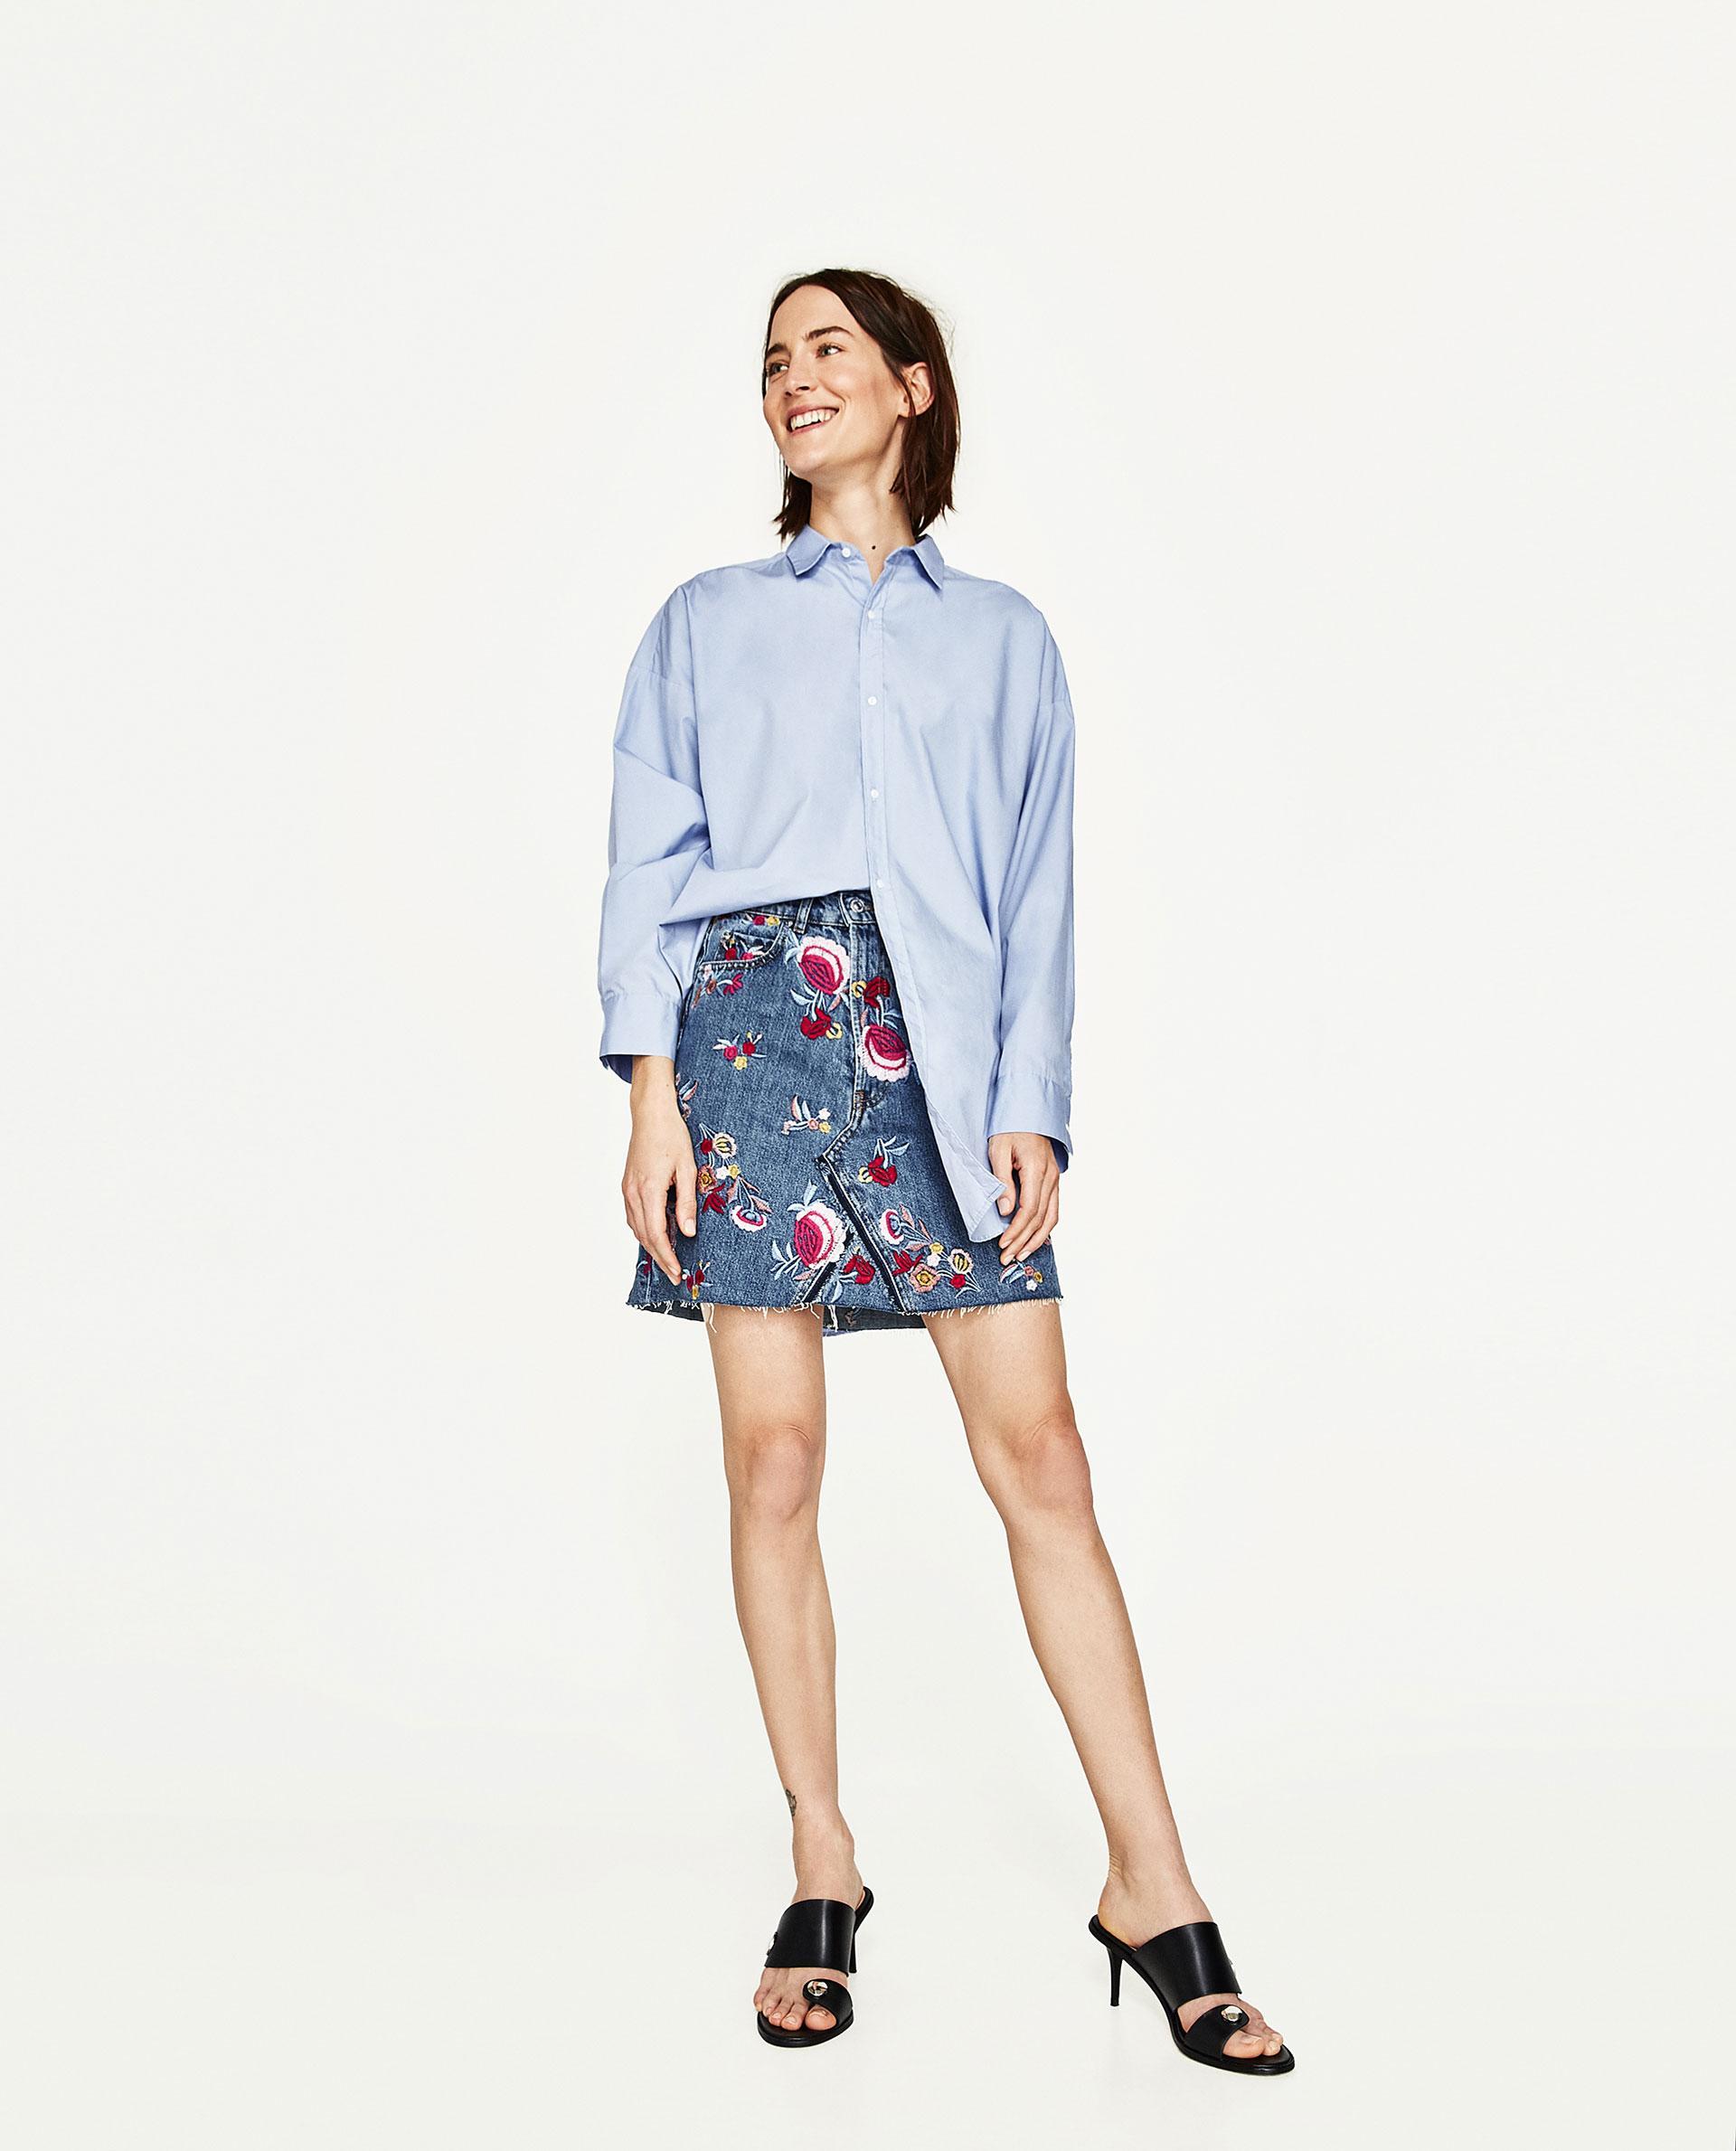 Zara premium collection embroidered floral denim skirt in